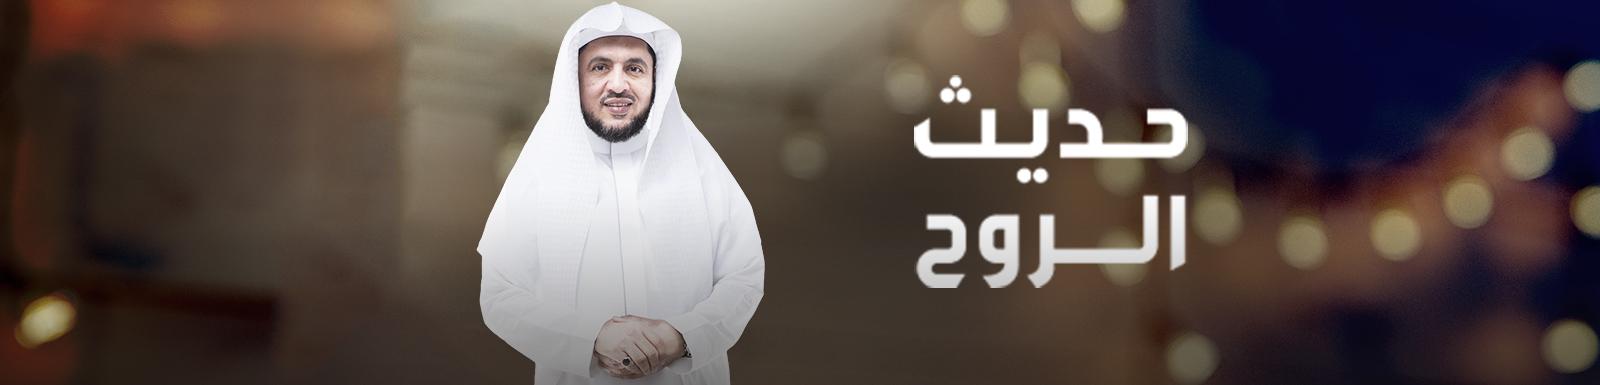 ����� ������ ���� ����� ������ 1 ���� �� 2016